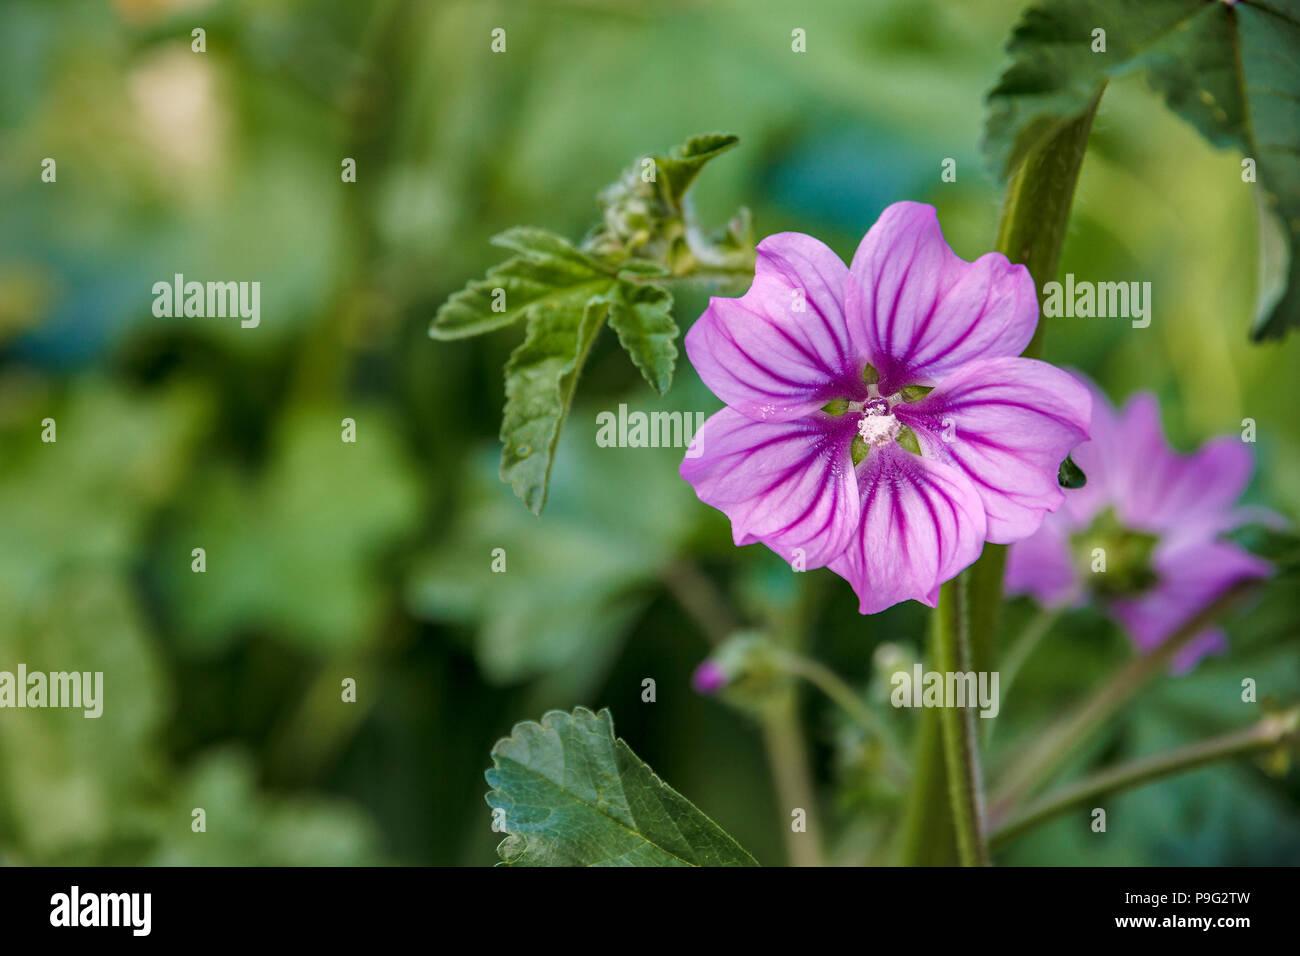 beautiful garden flower on green blurred background - Stock Image